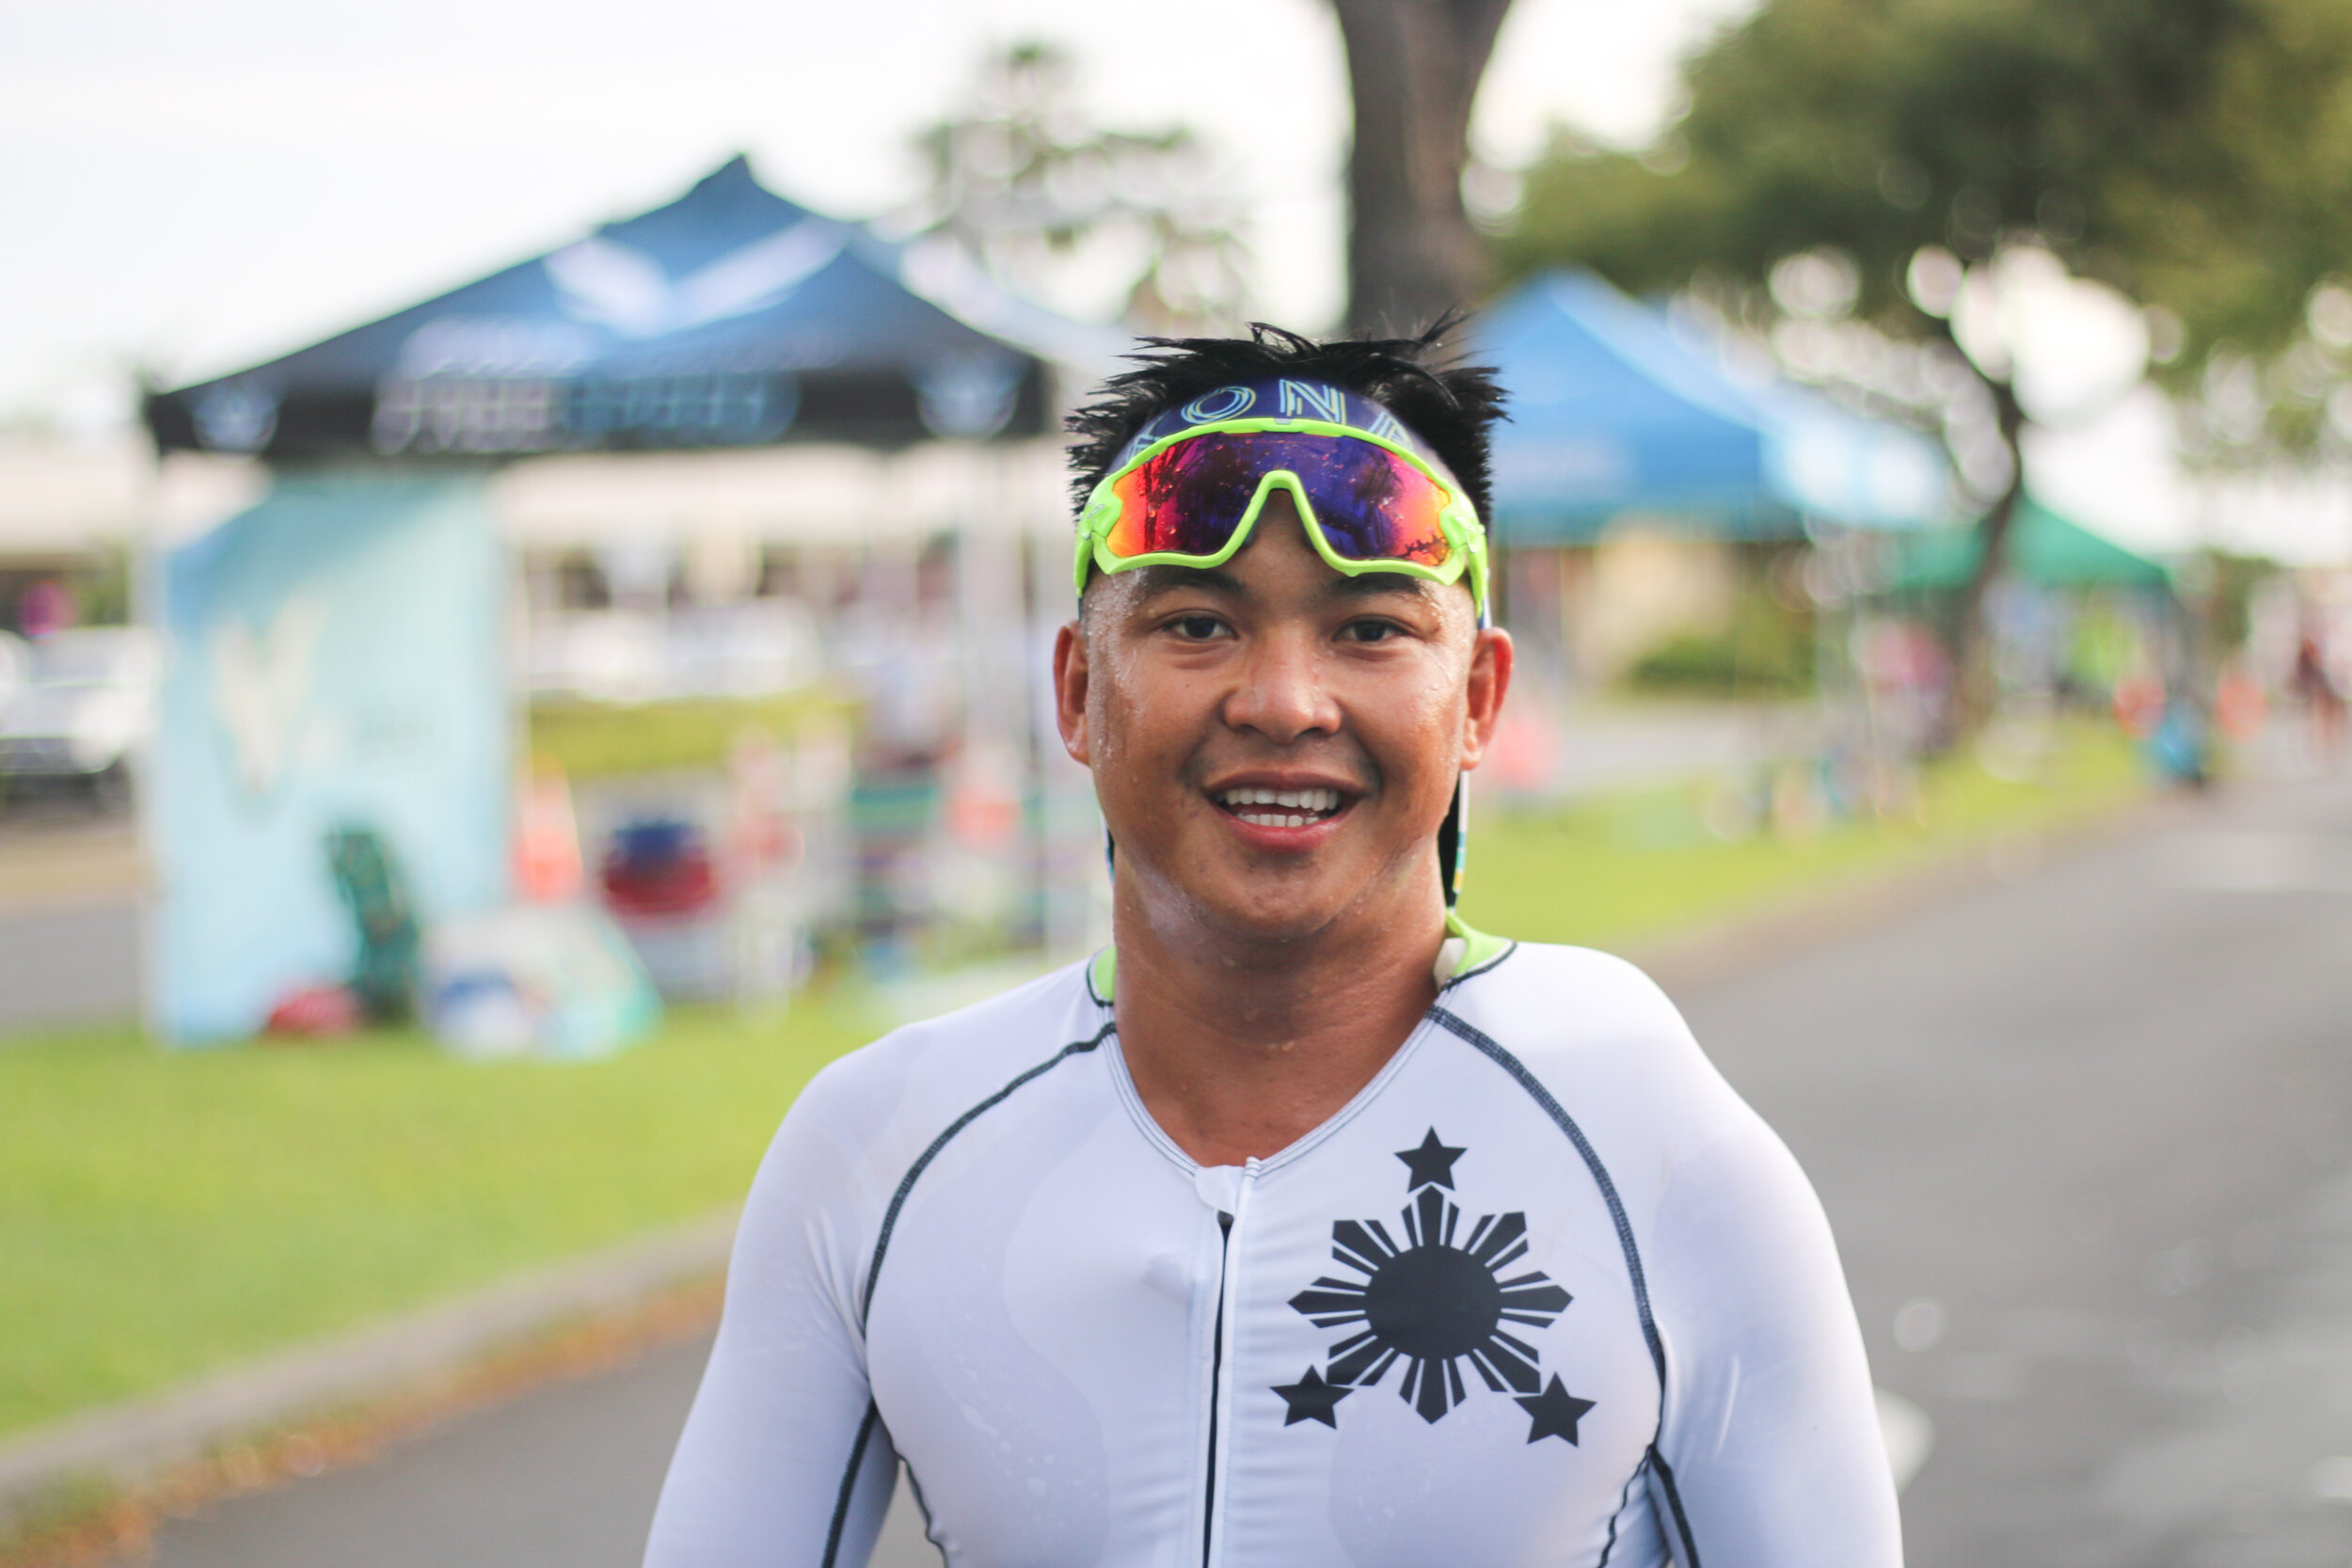 Cisco on his run during 2019 Ironman Championship.jpg